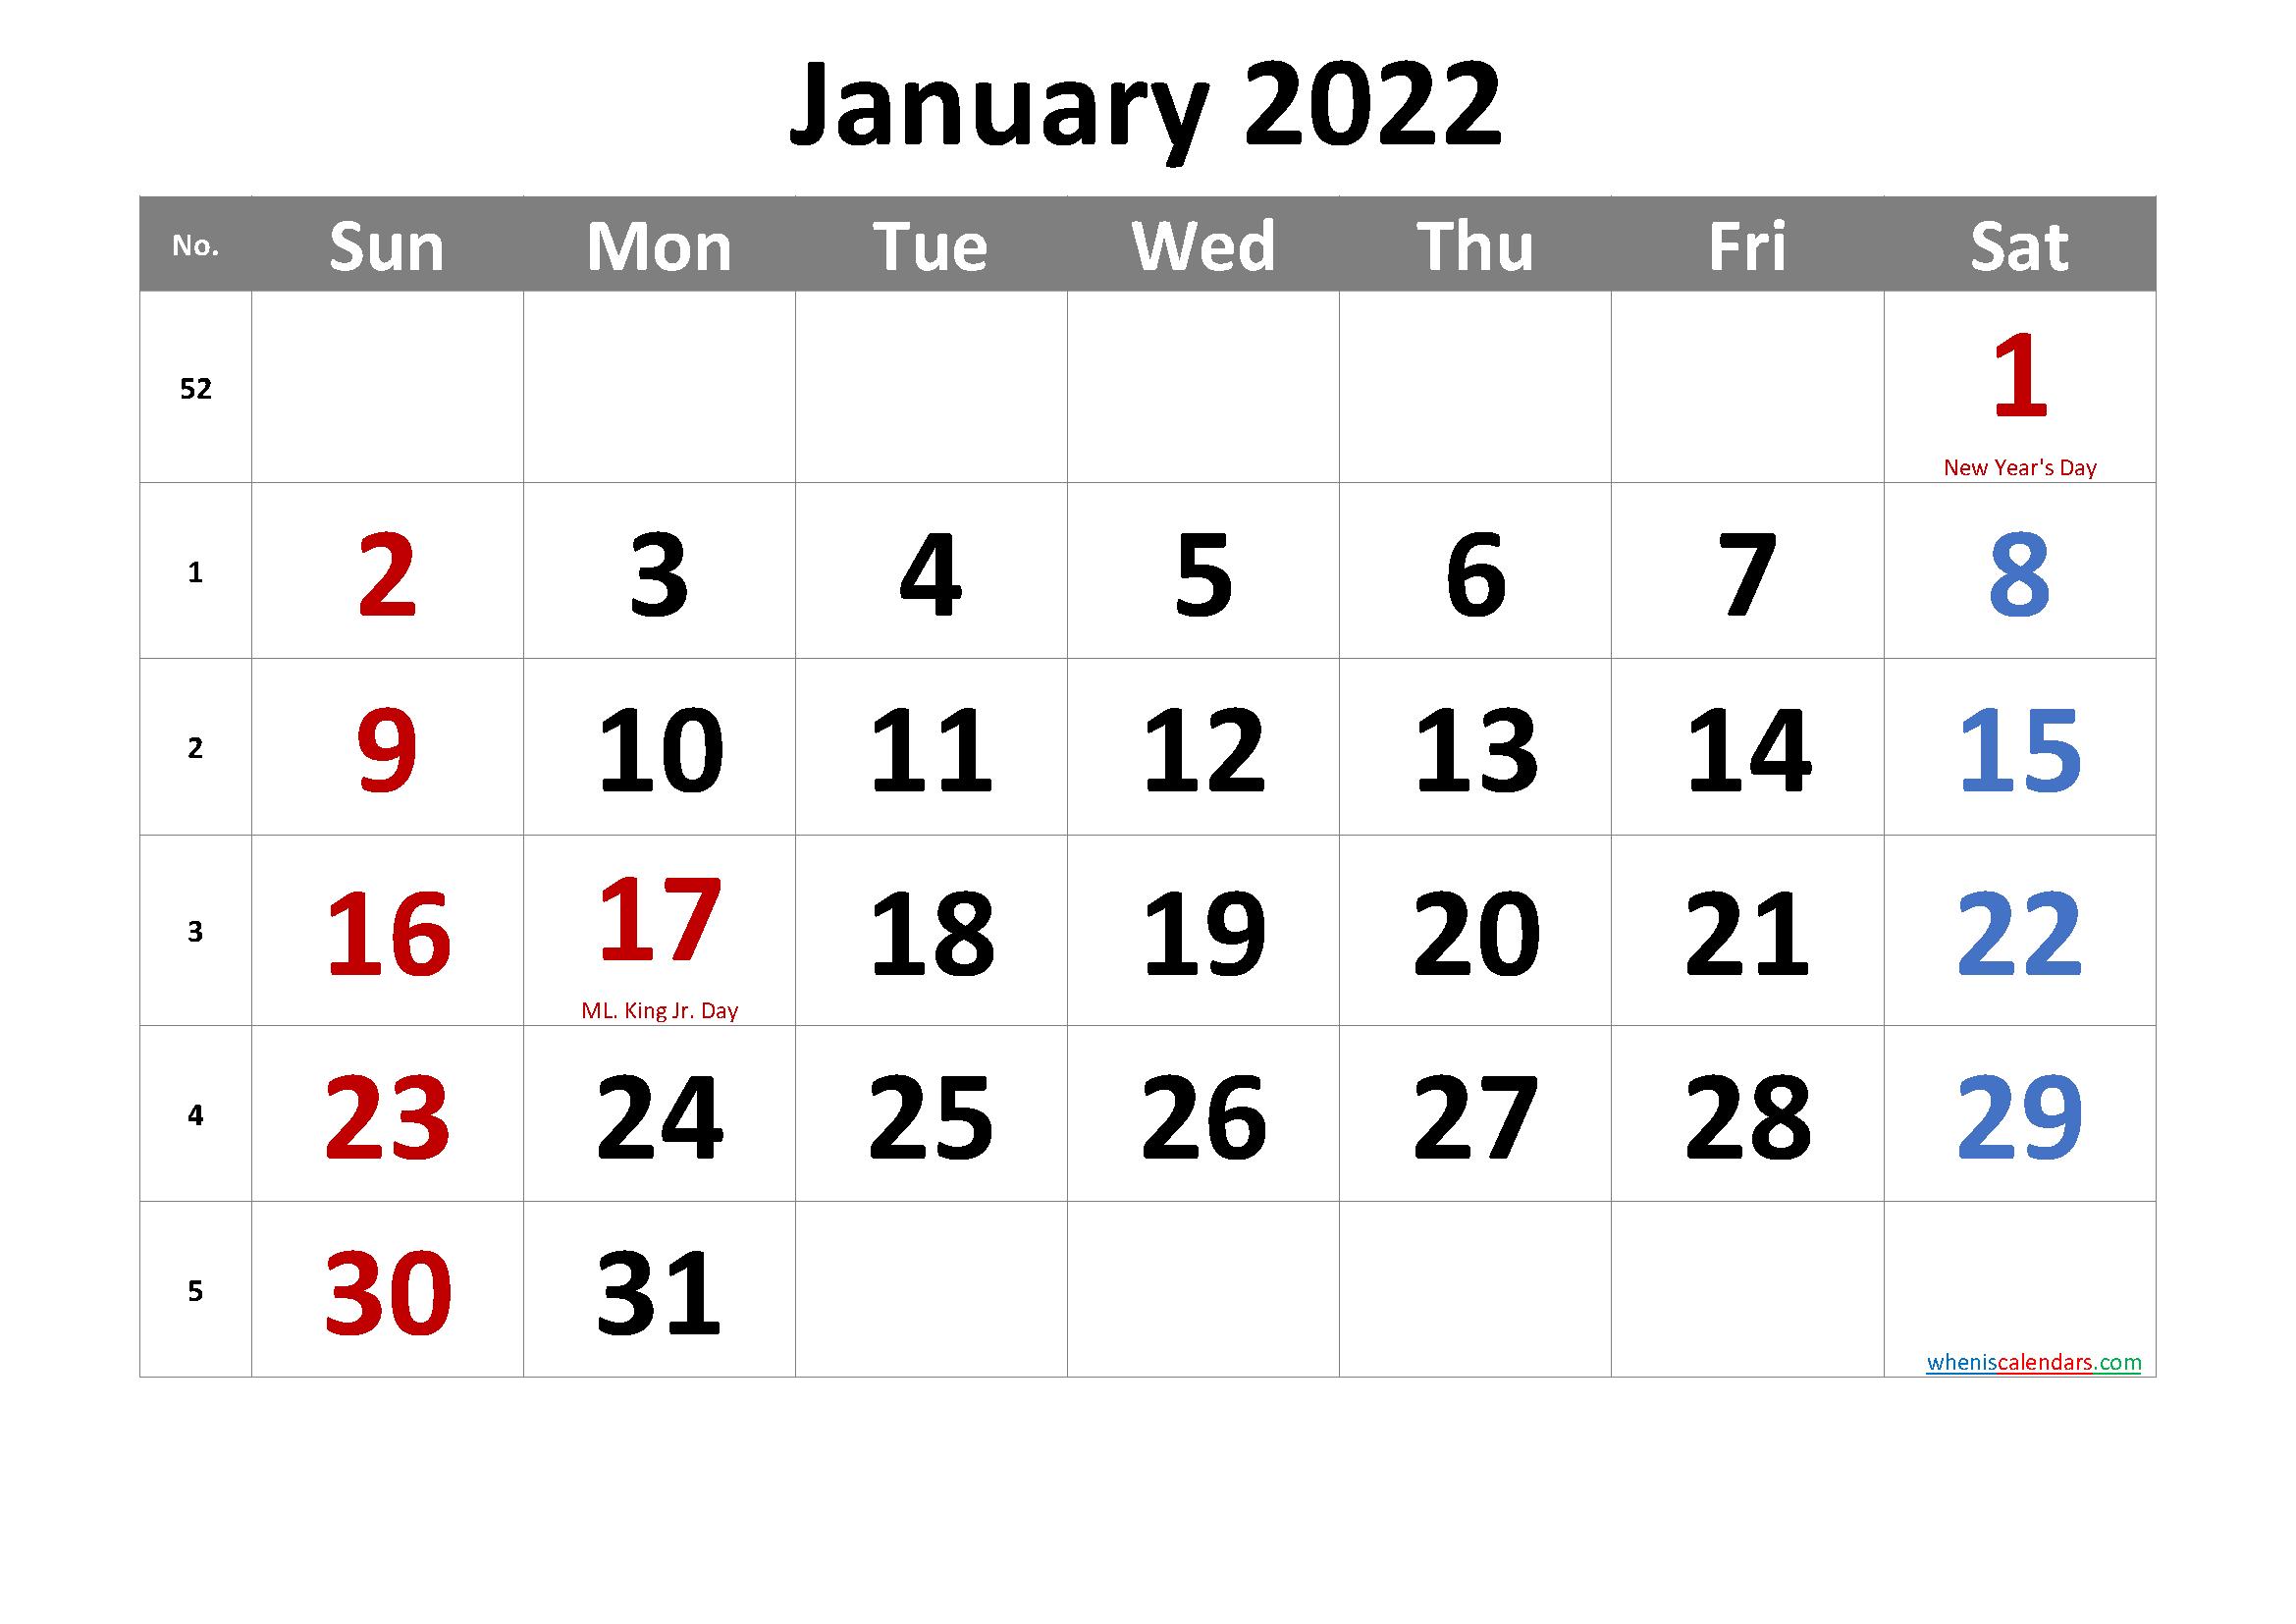 Free January 2022 Calendar Printable in Januarycalendar 2022 With Holidays